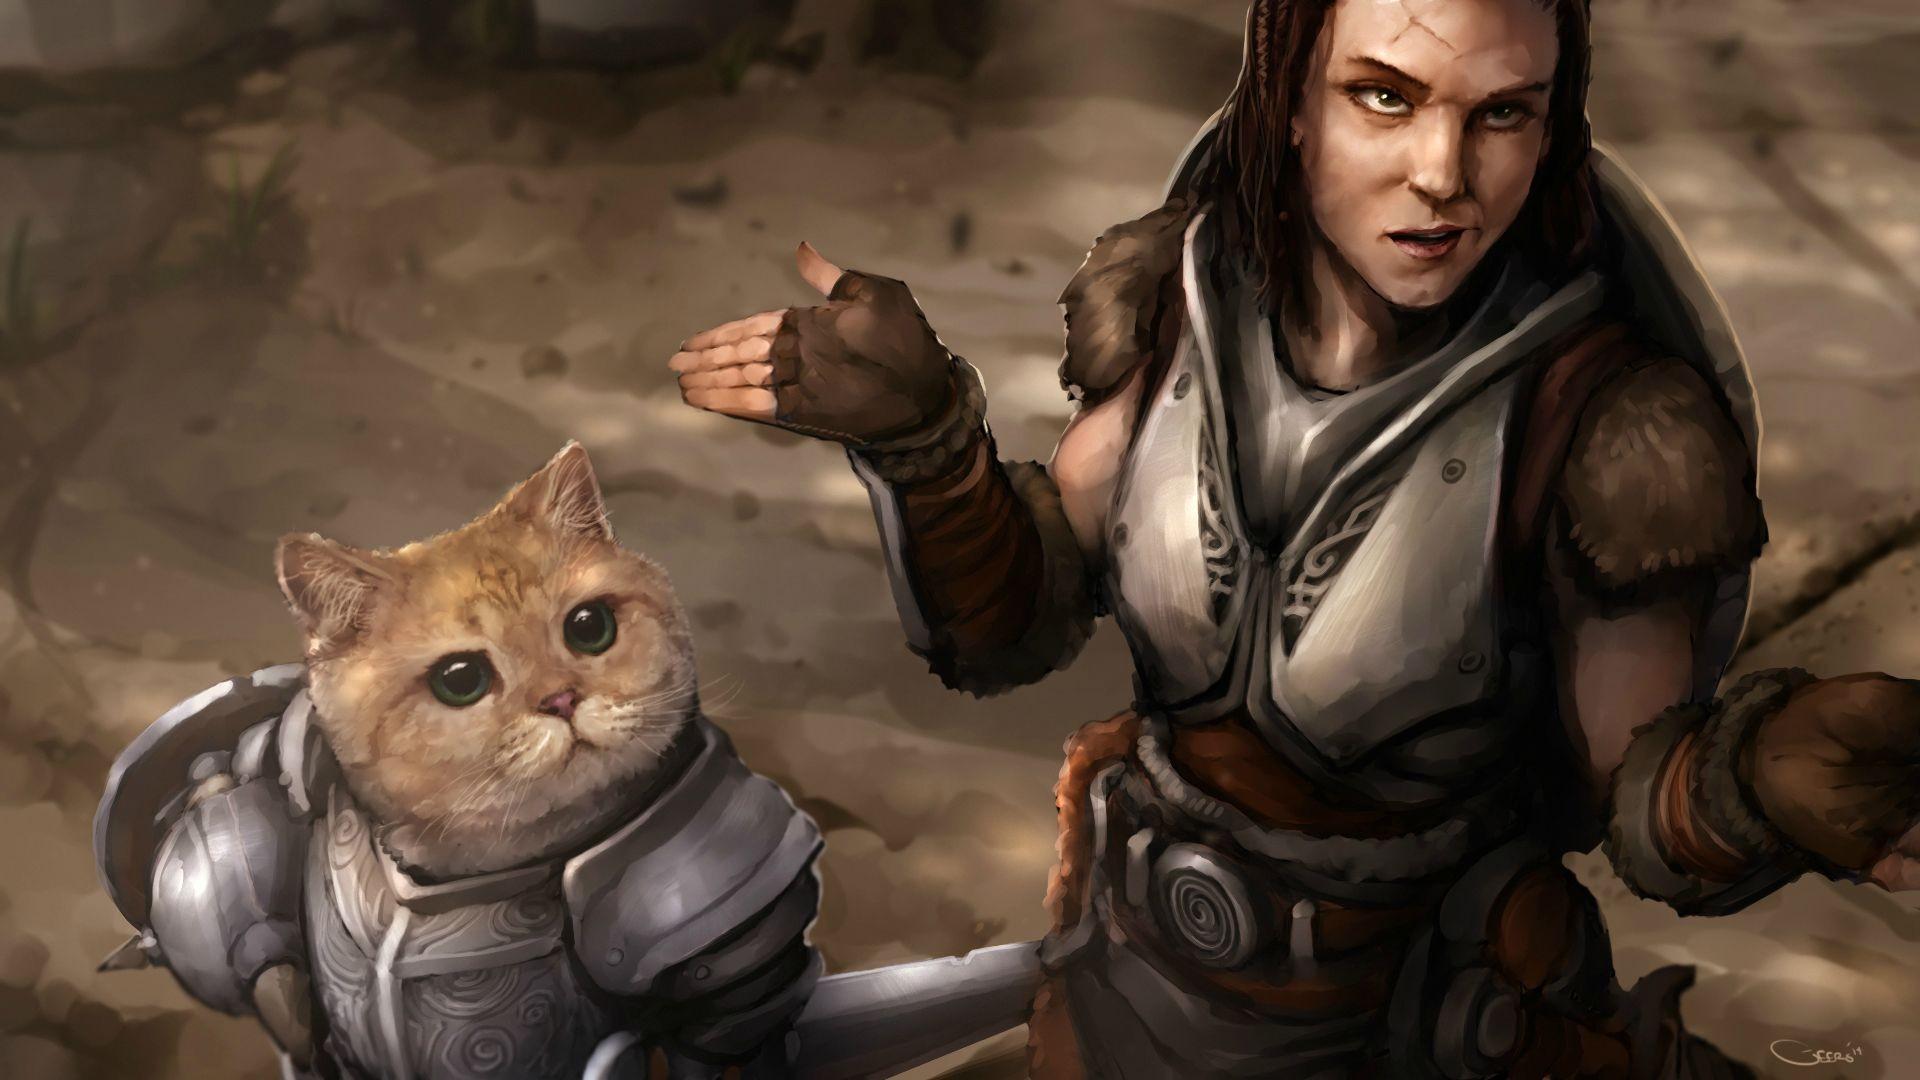 Wallpaper : cat, video games, The Elder Scrolls V Skyrim